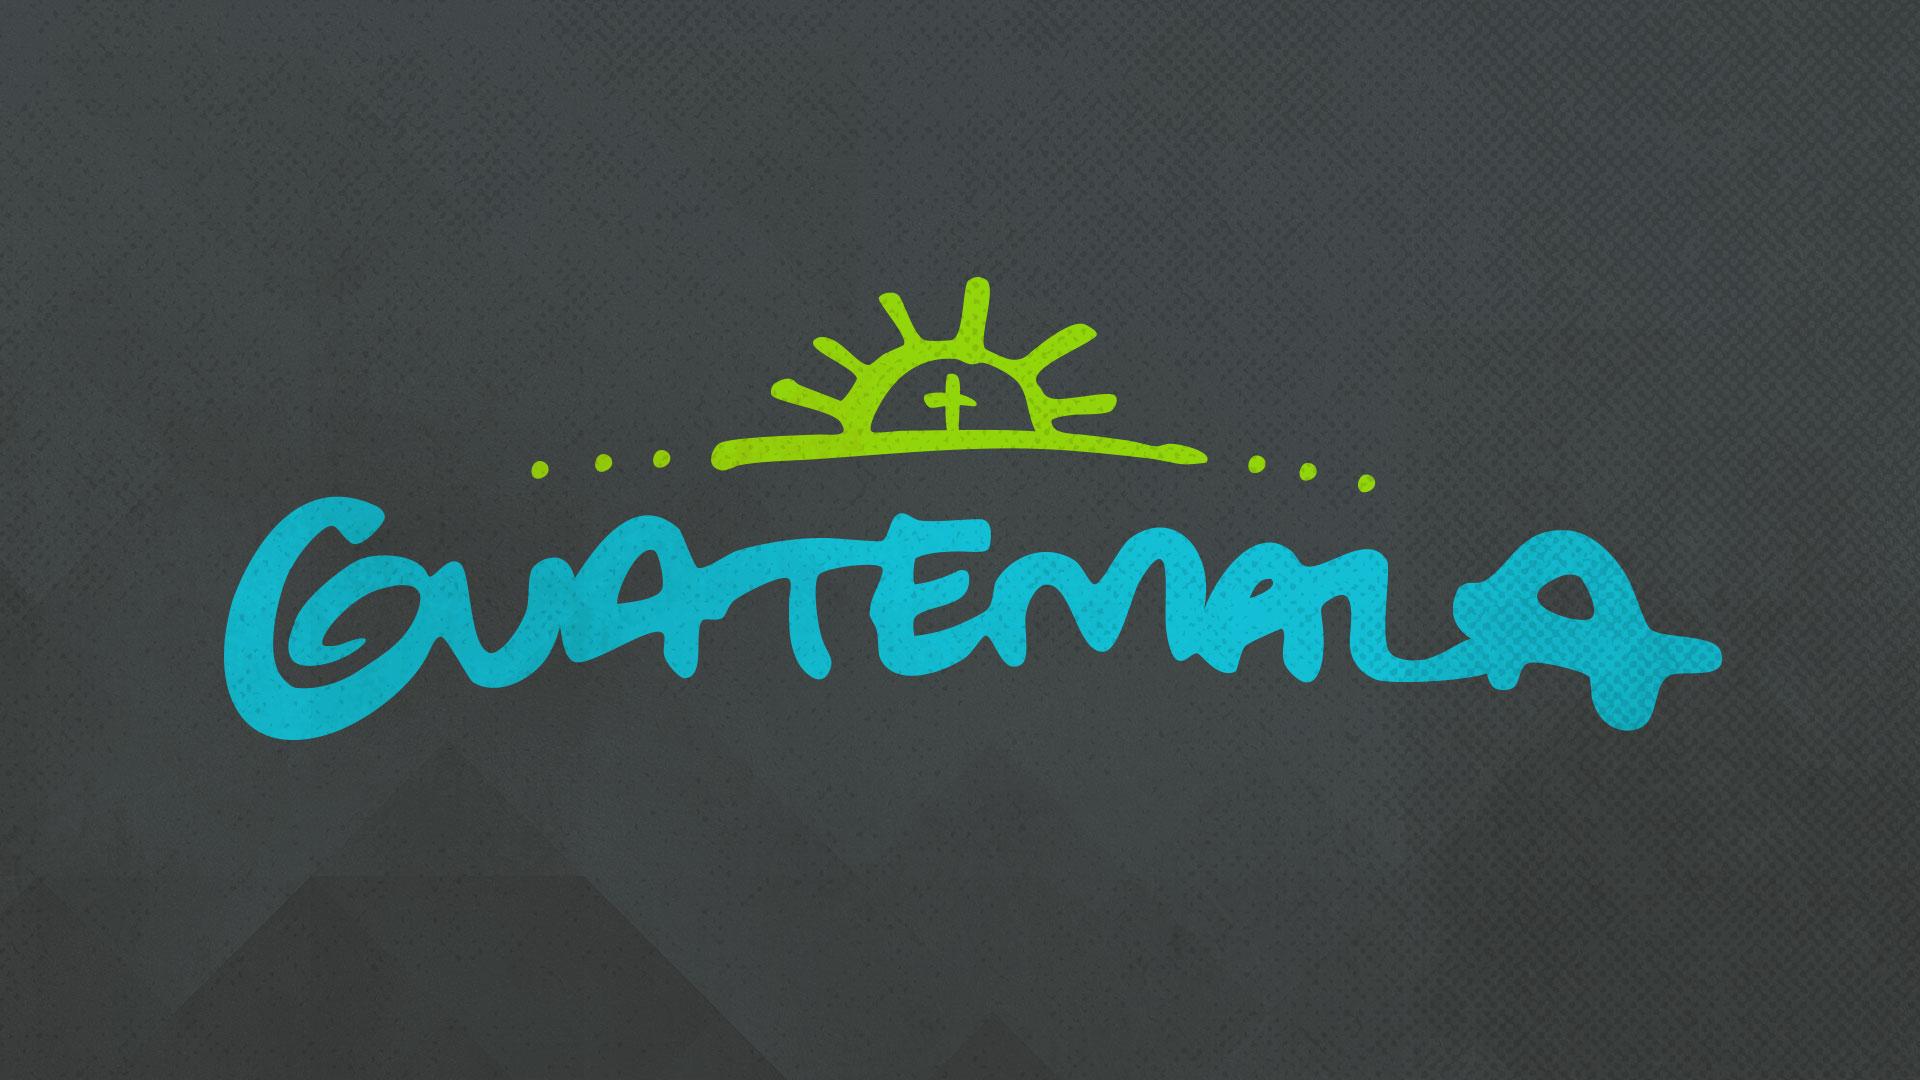 Capital Guatemala